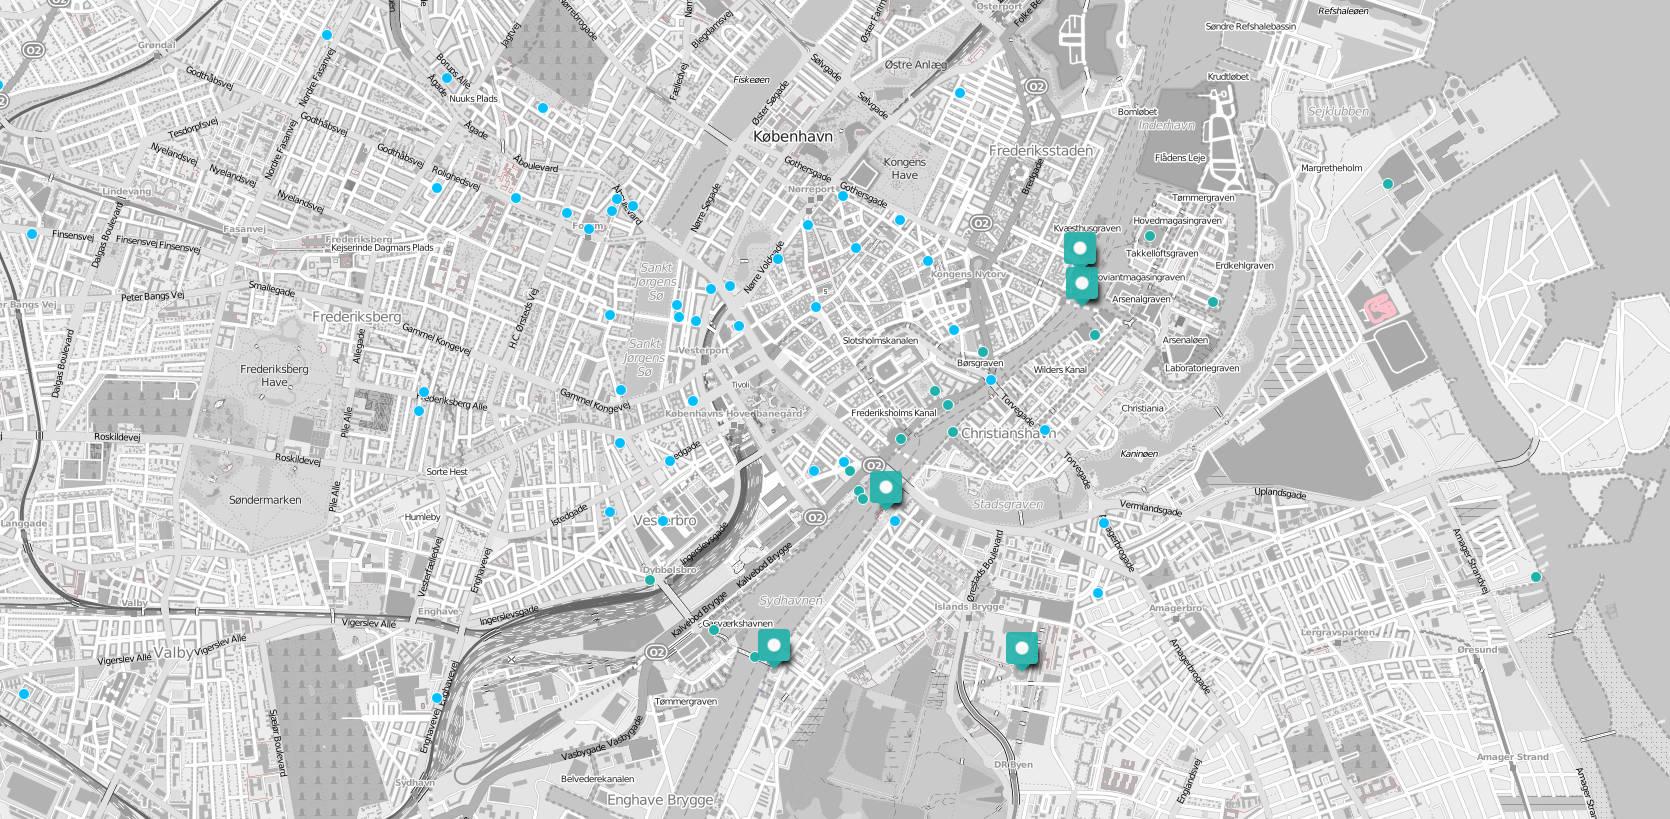 Copenhagen architecture map